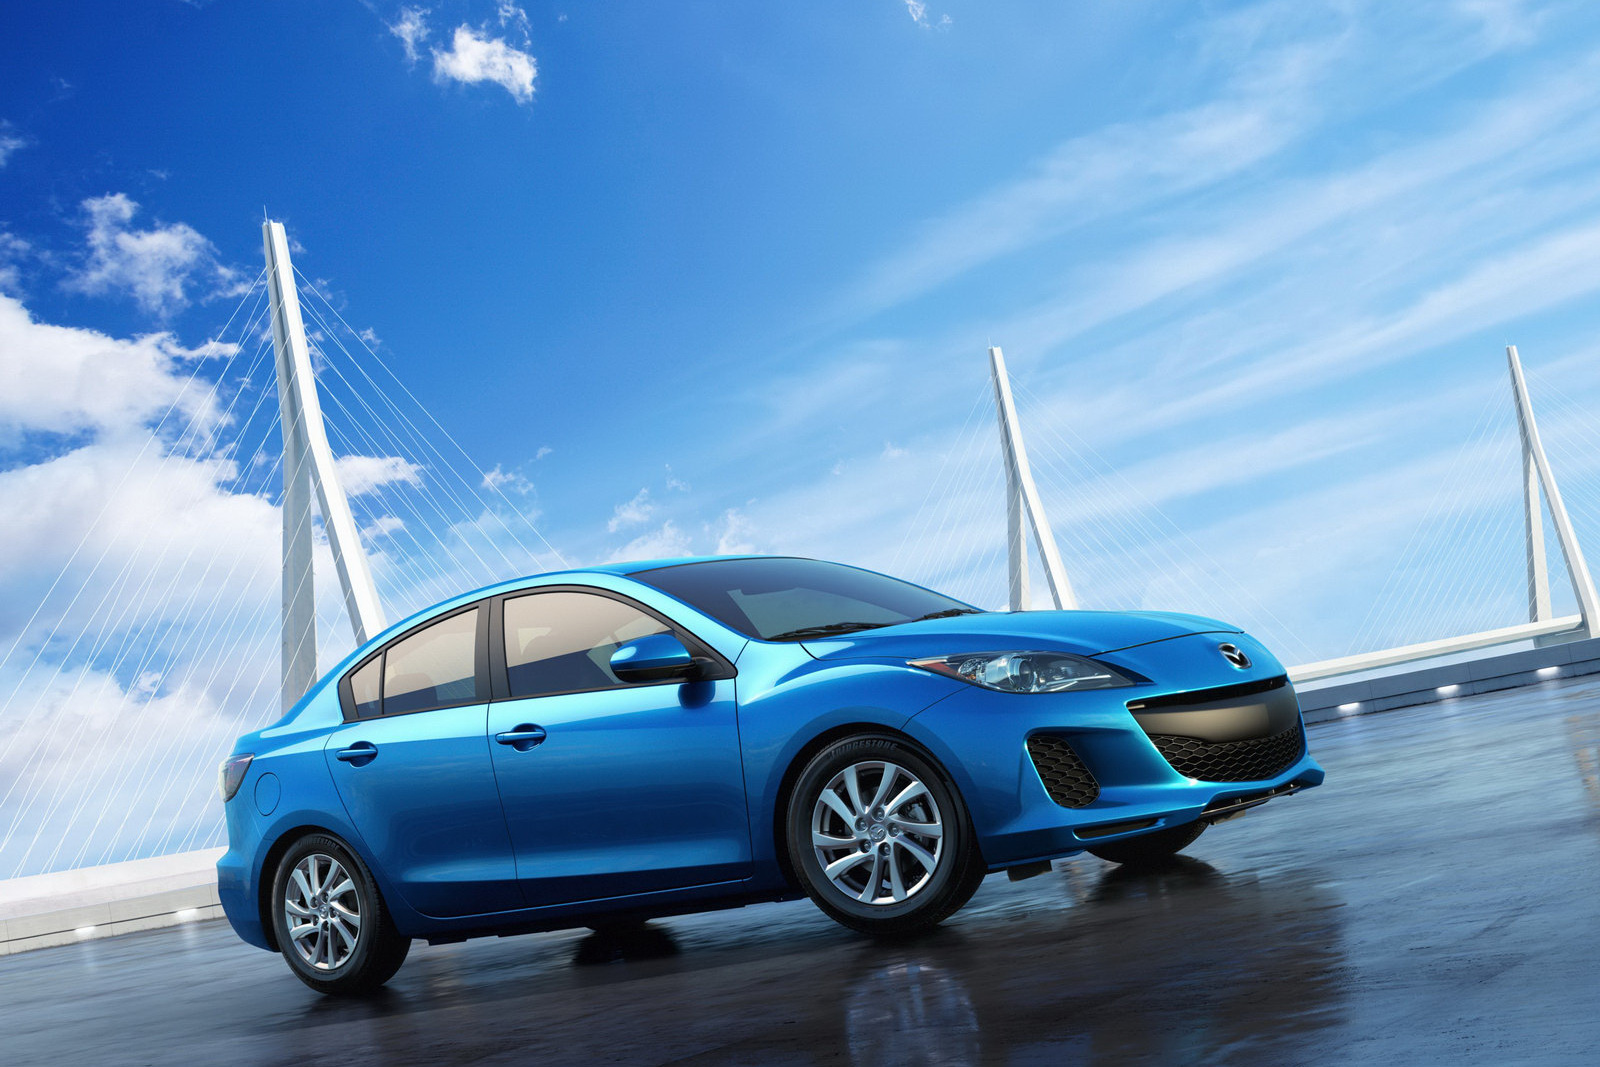 Kelebihan Mazda 3 2012 Tangguh